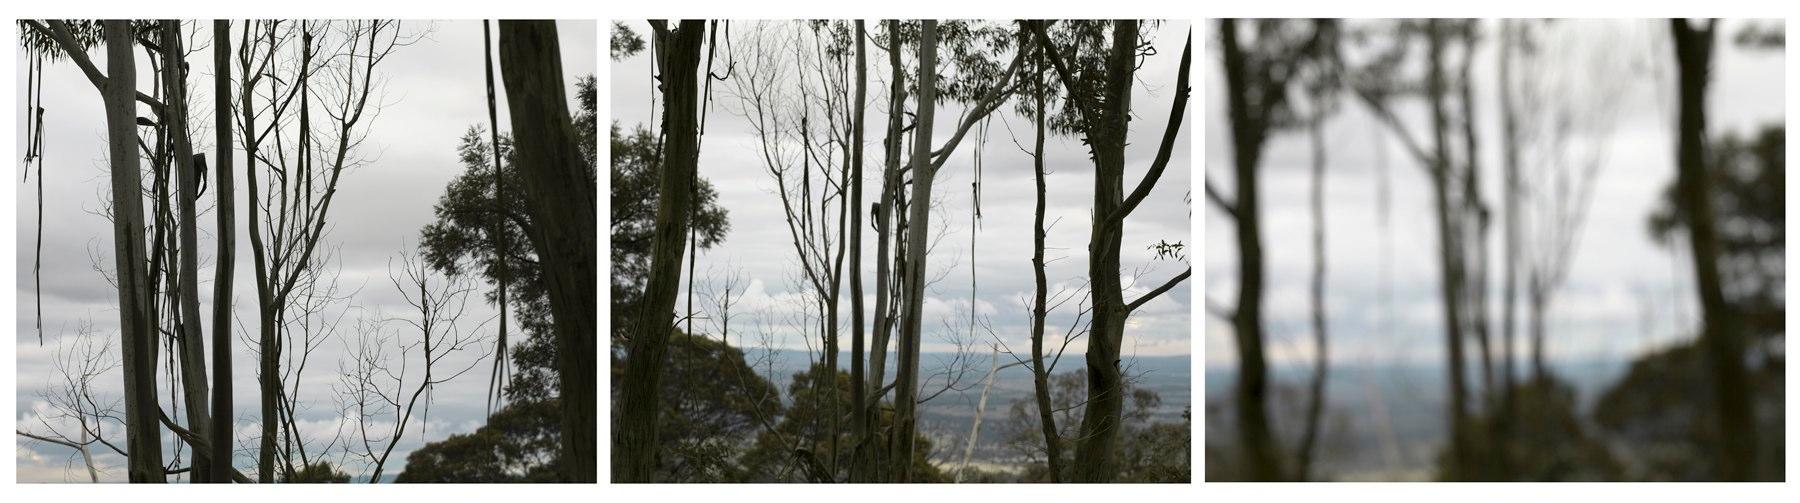 Goldfield Study, Mt. Alexander (Manna Gums on Lookout #1)